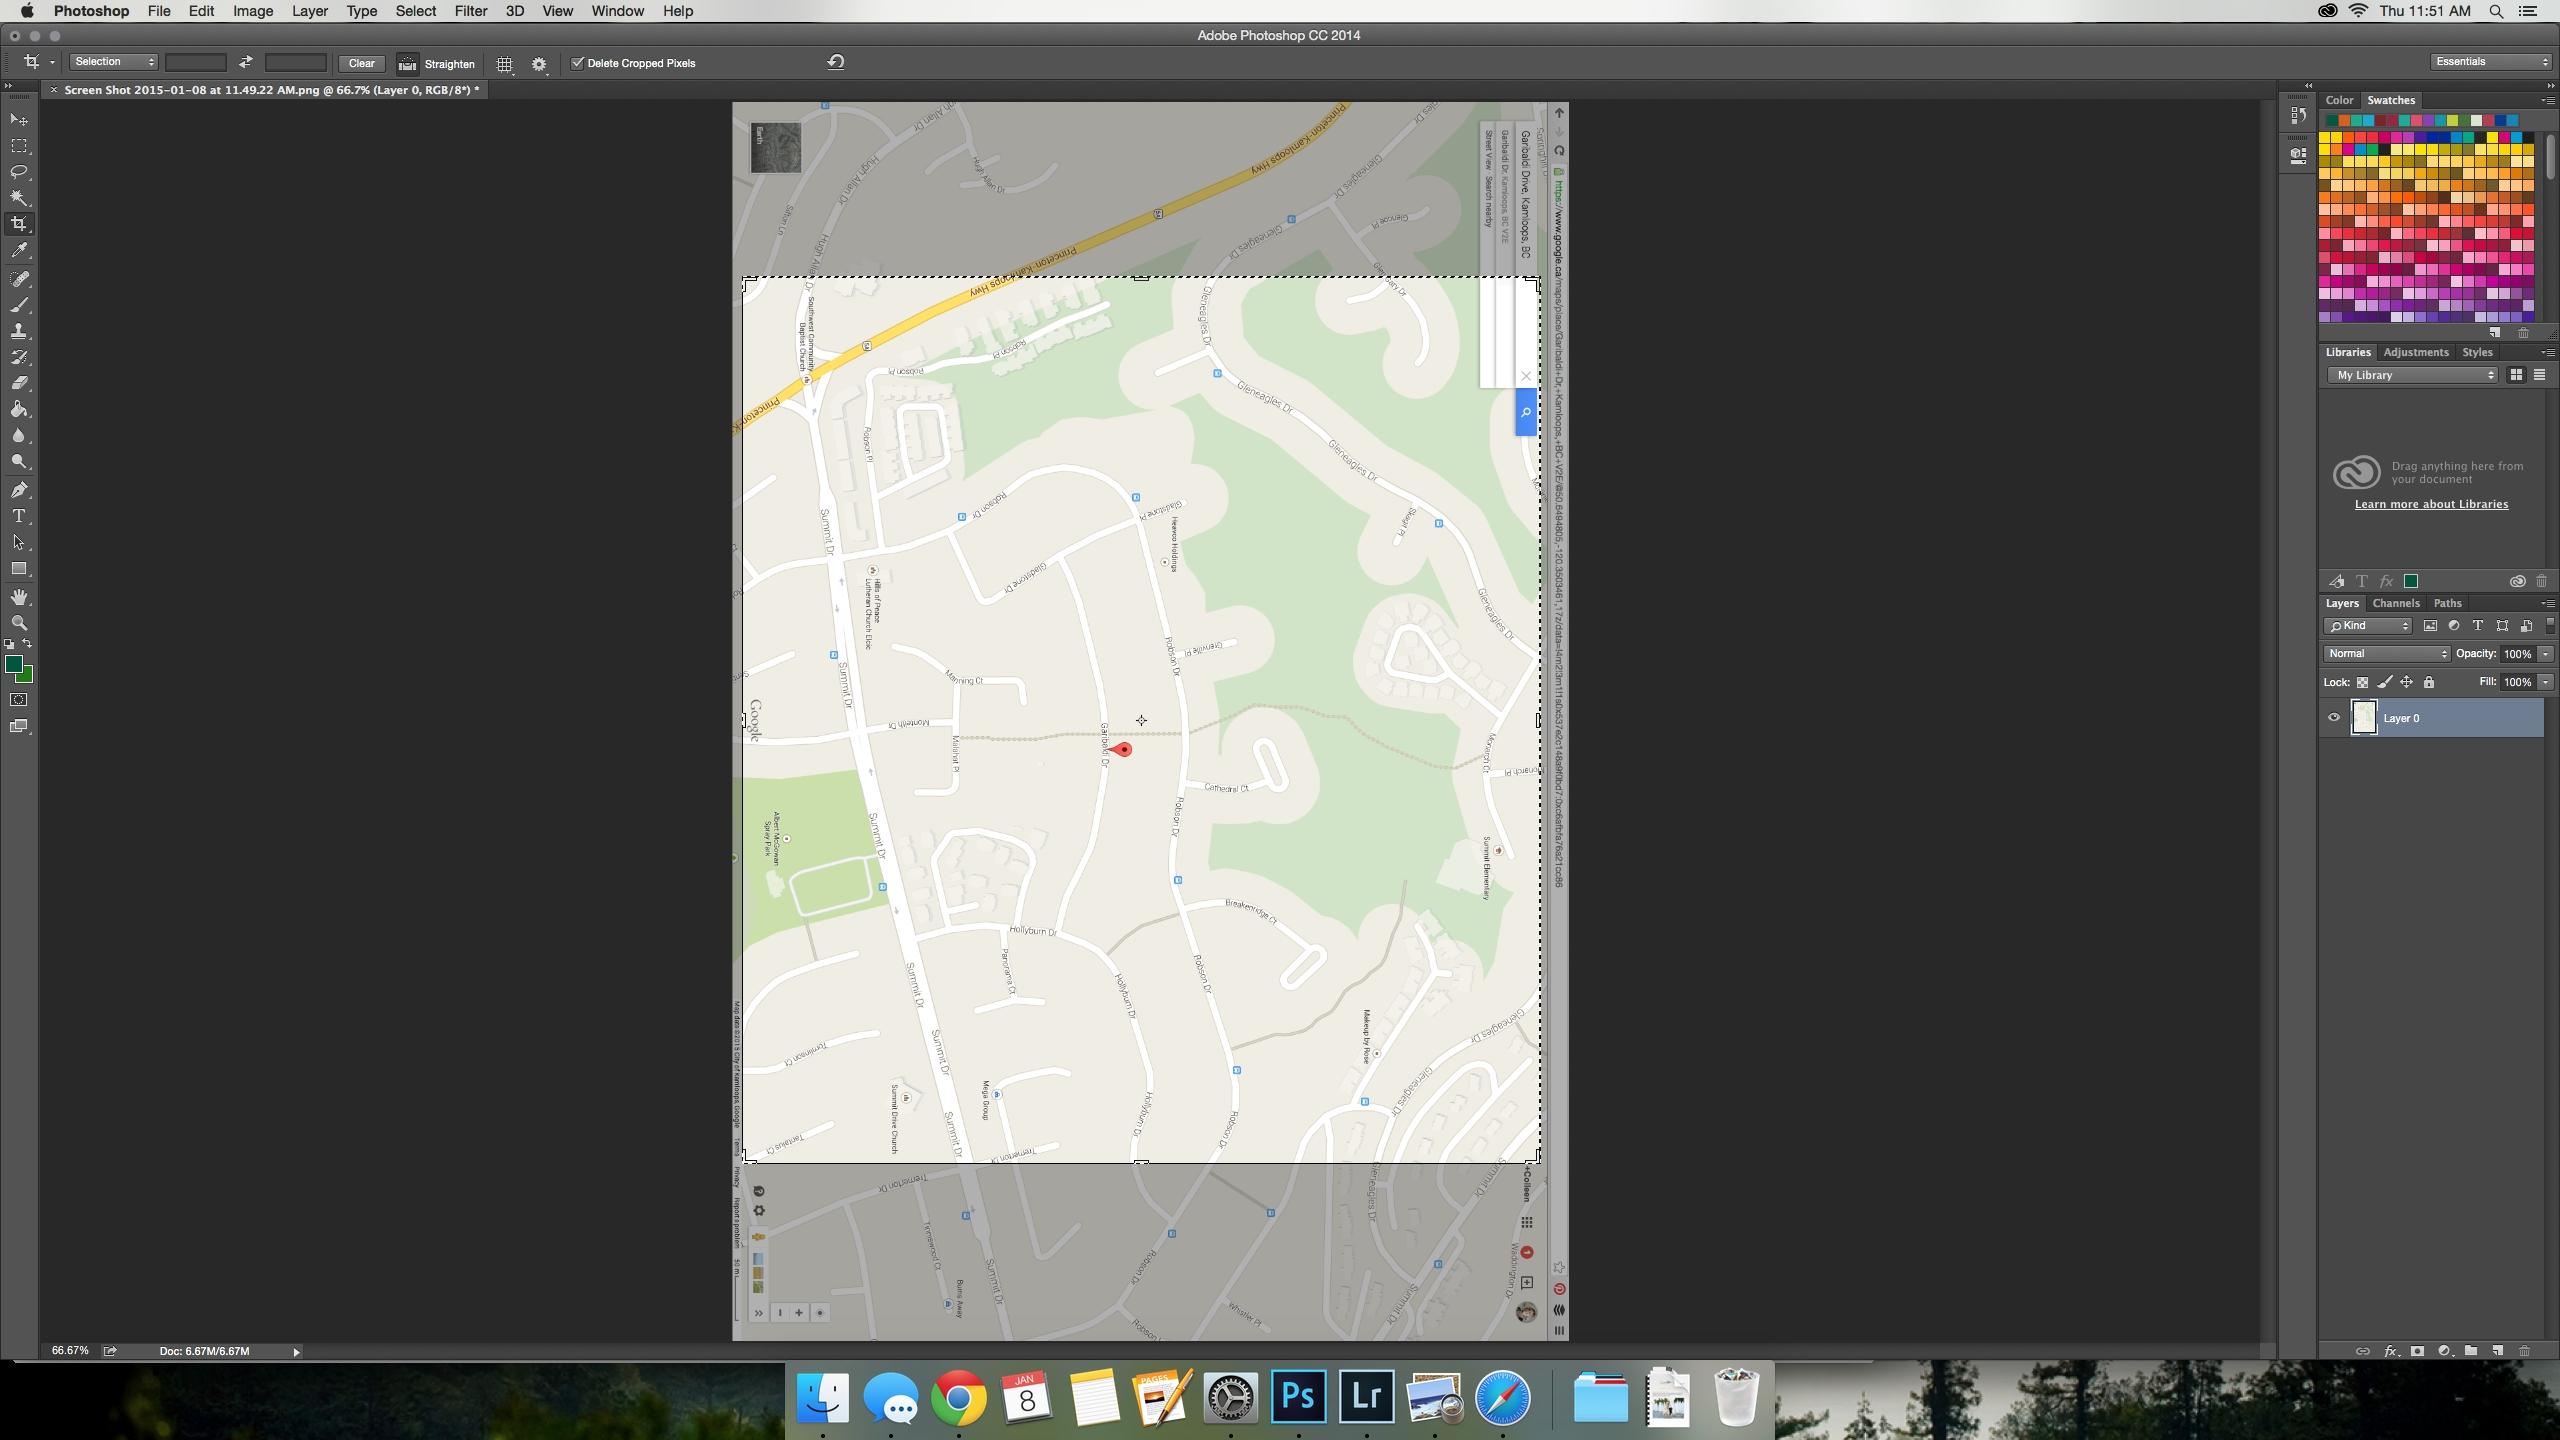 Diy Custom Street Maps Wall Art – Lemon Thistle With Current Street Map Wall Art (View 9 of 20)